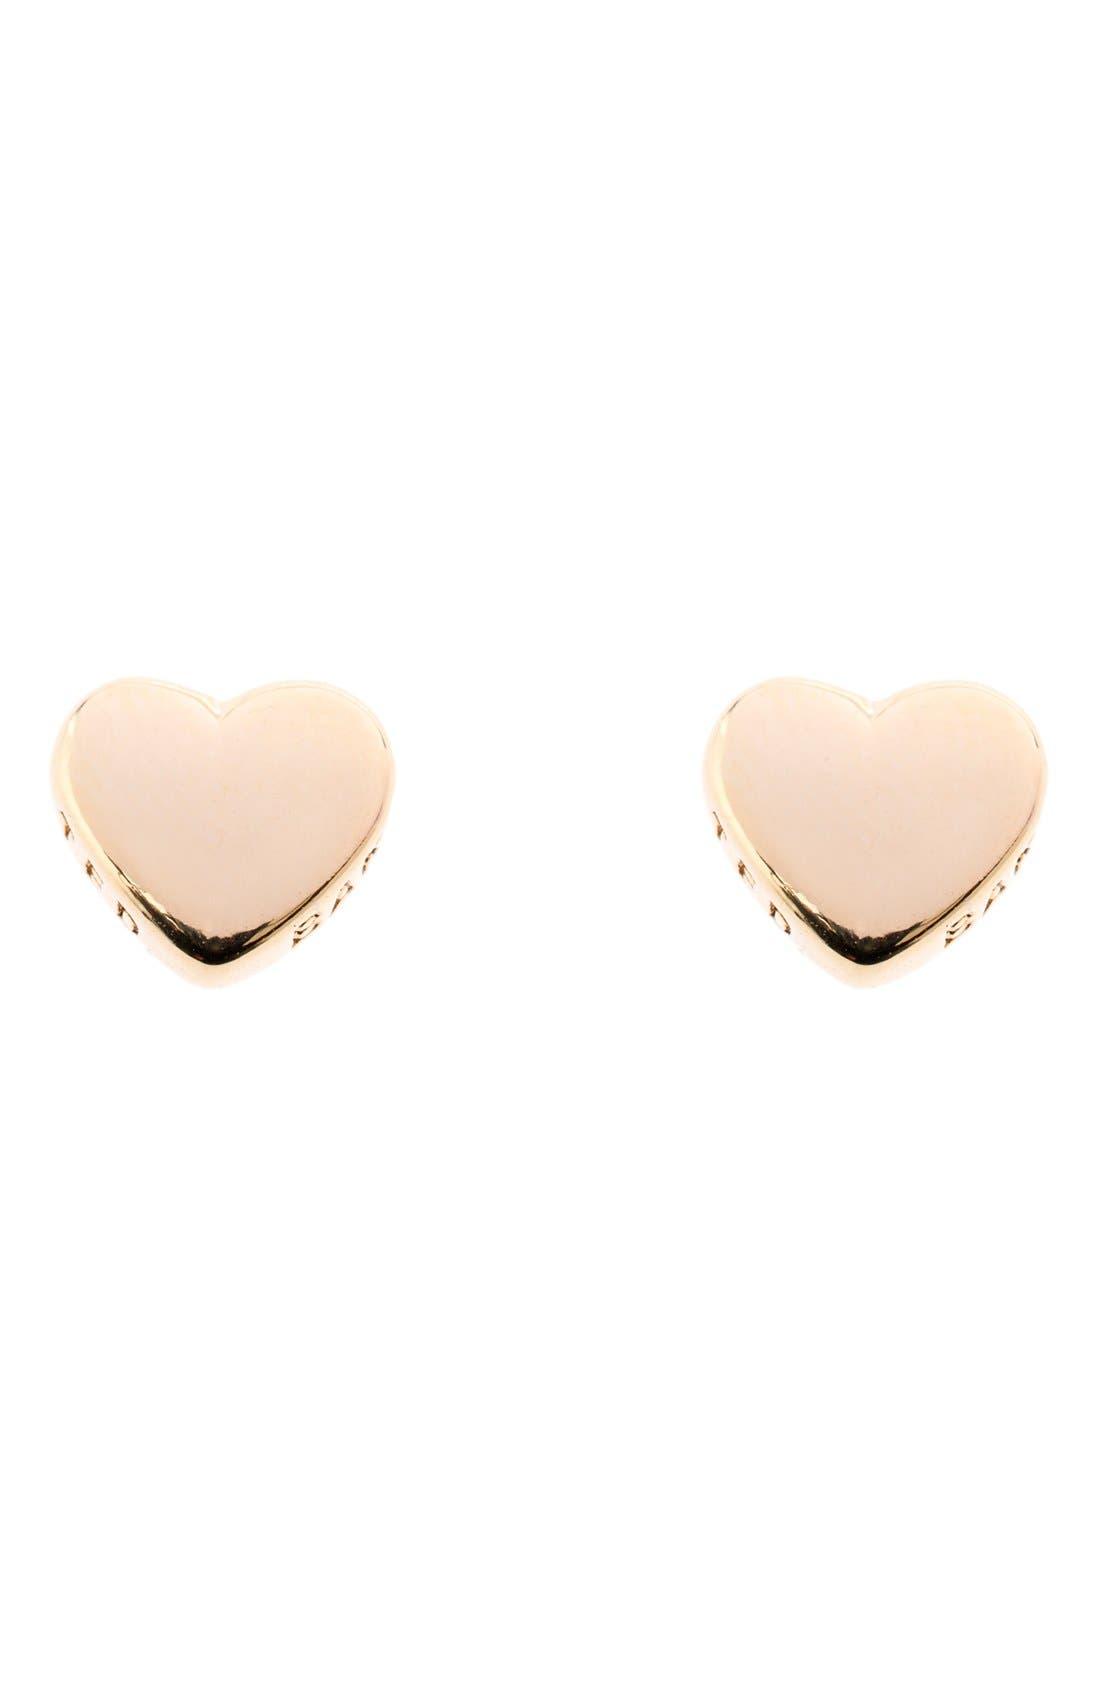 'Tiny Heart' Stud Earrings,                             Main thumbnail 1, color,                             040